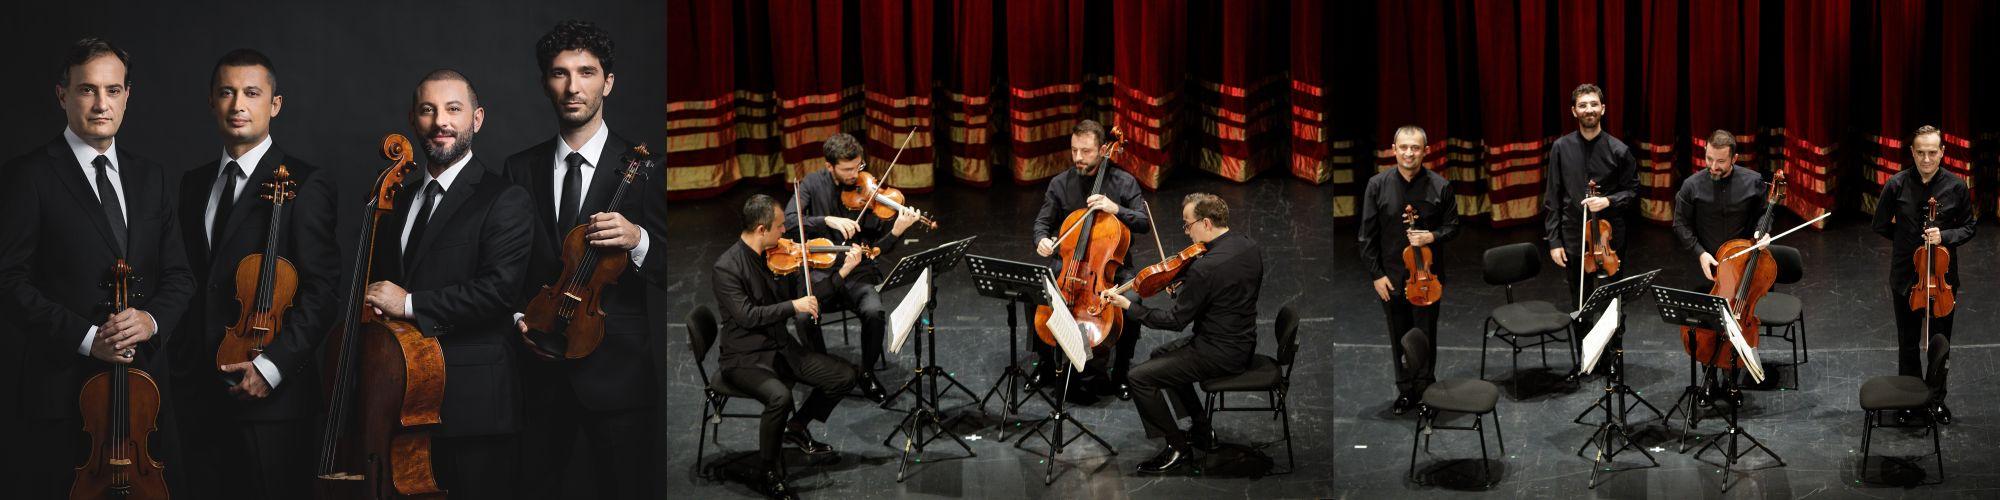 Borusan Quartet LVHF2020